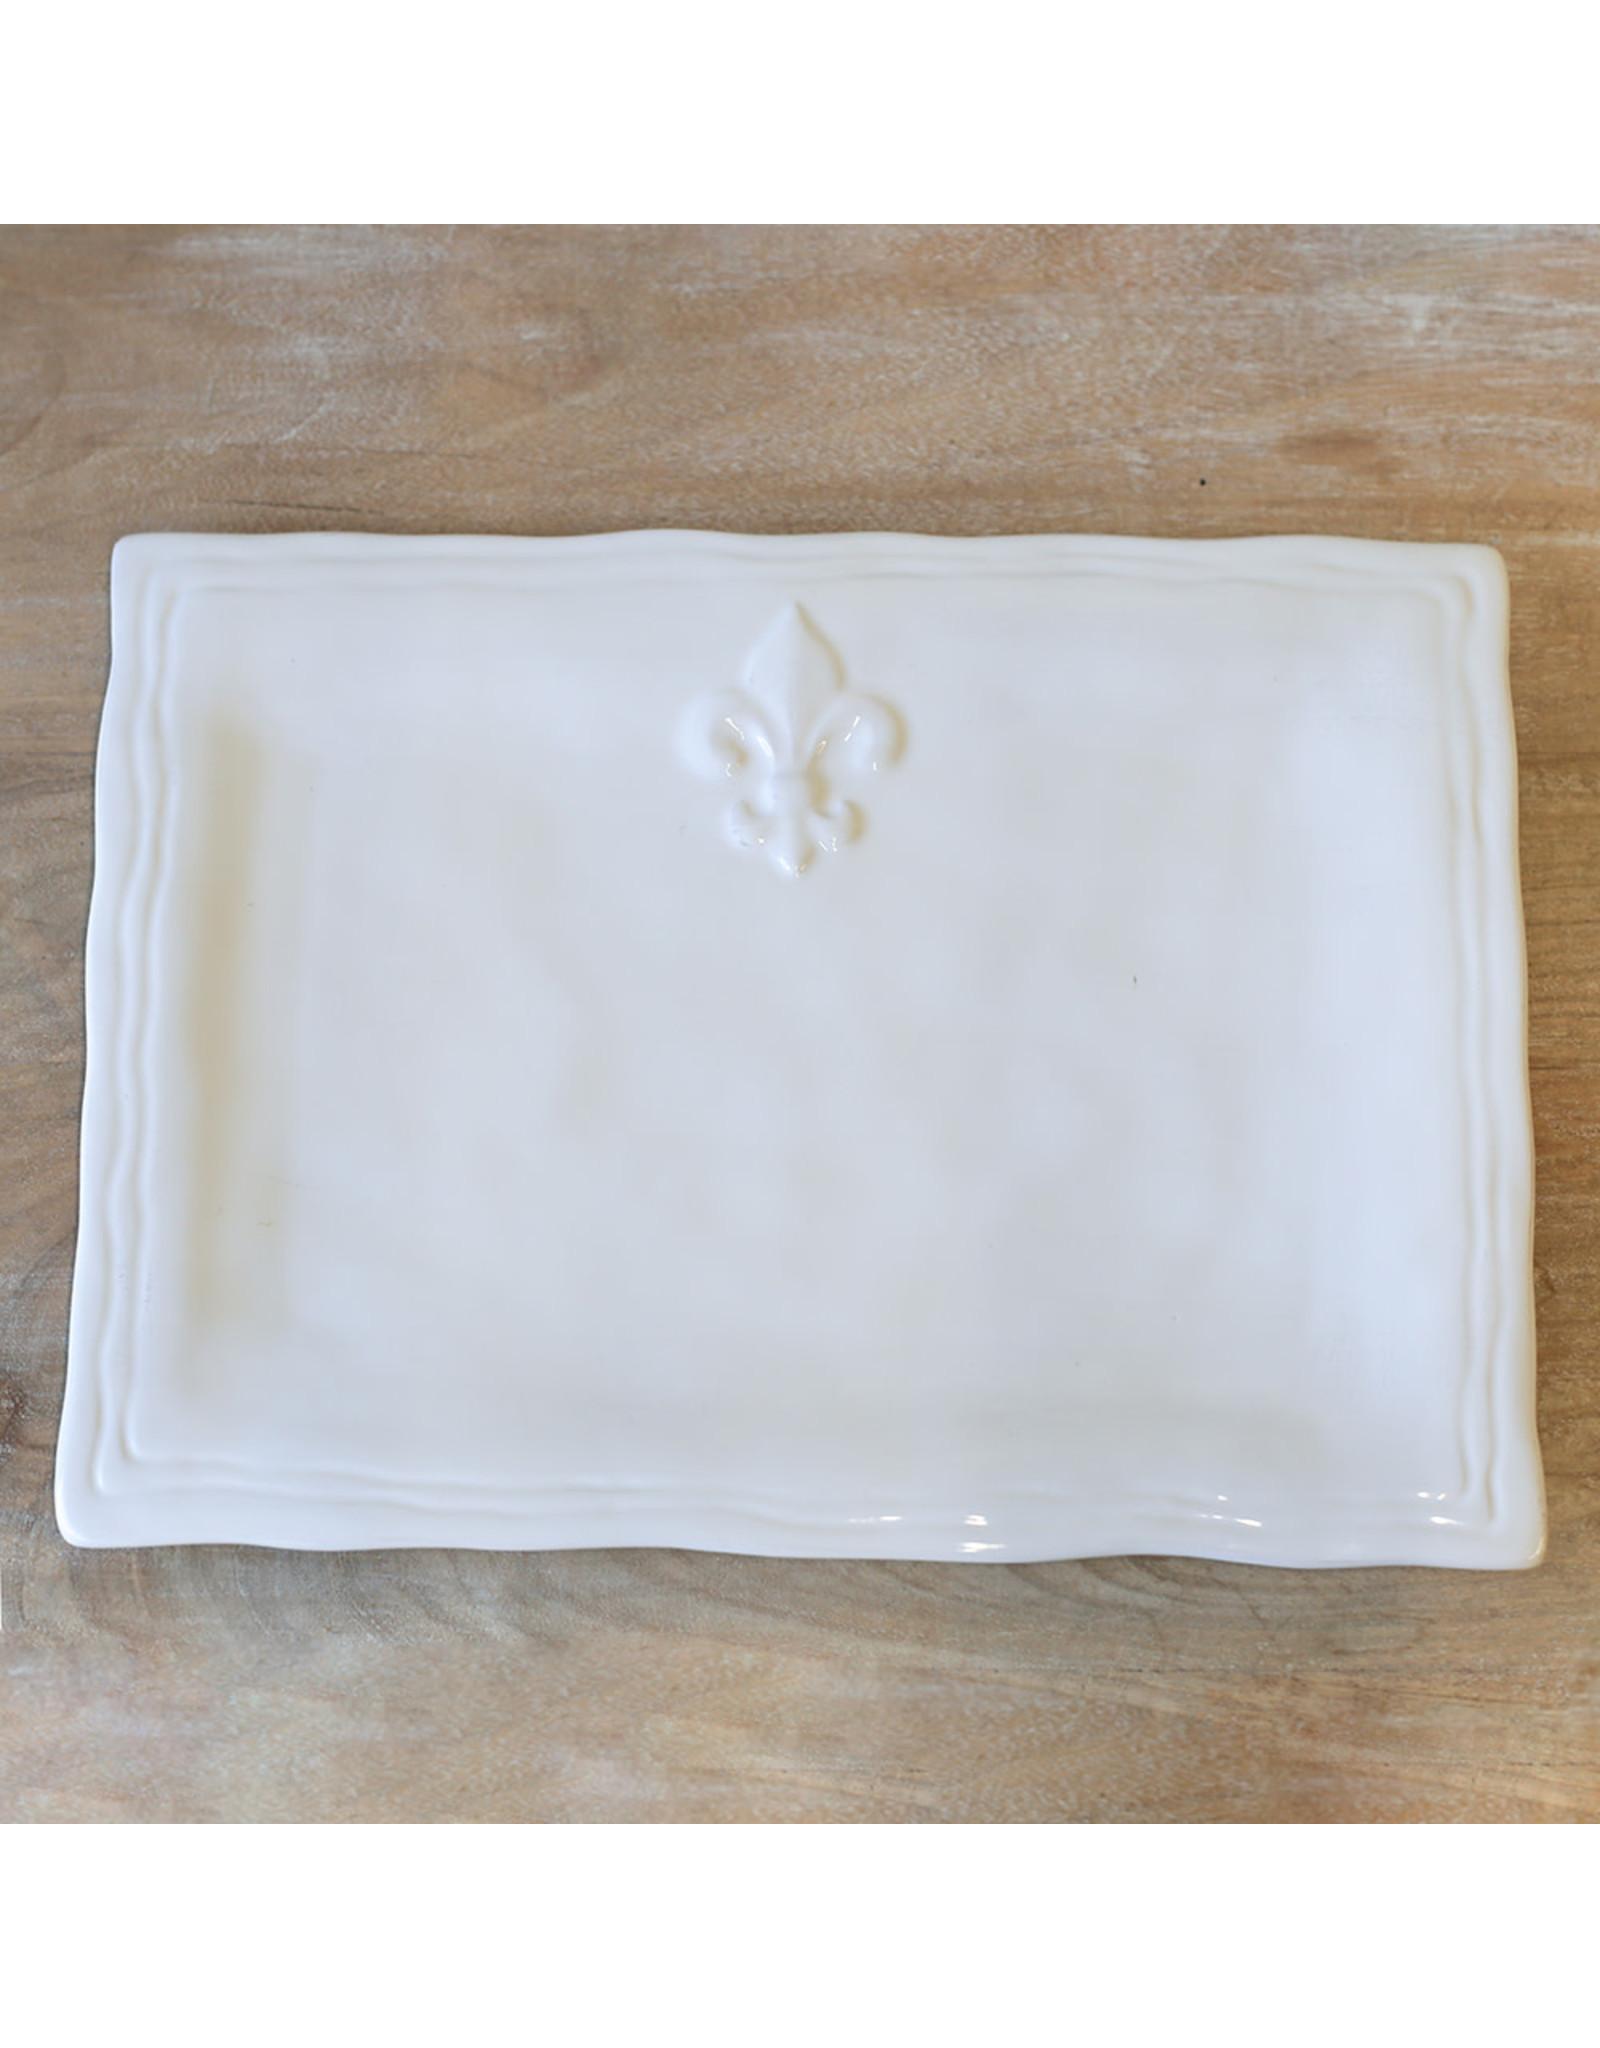 The Royal Standard FDL Platter-Antique White 15.5x11.5